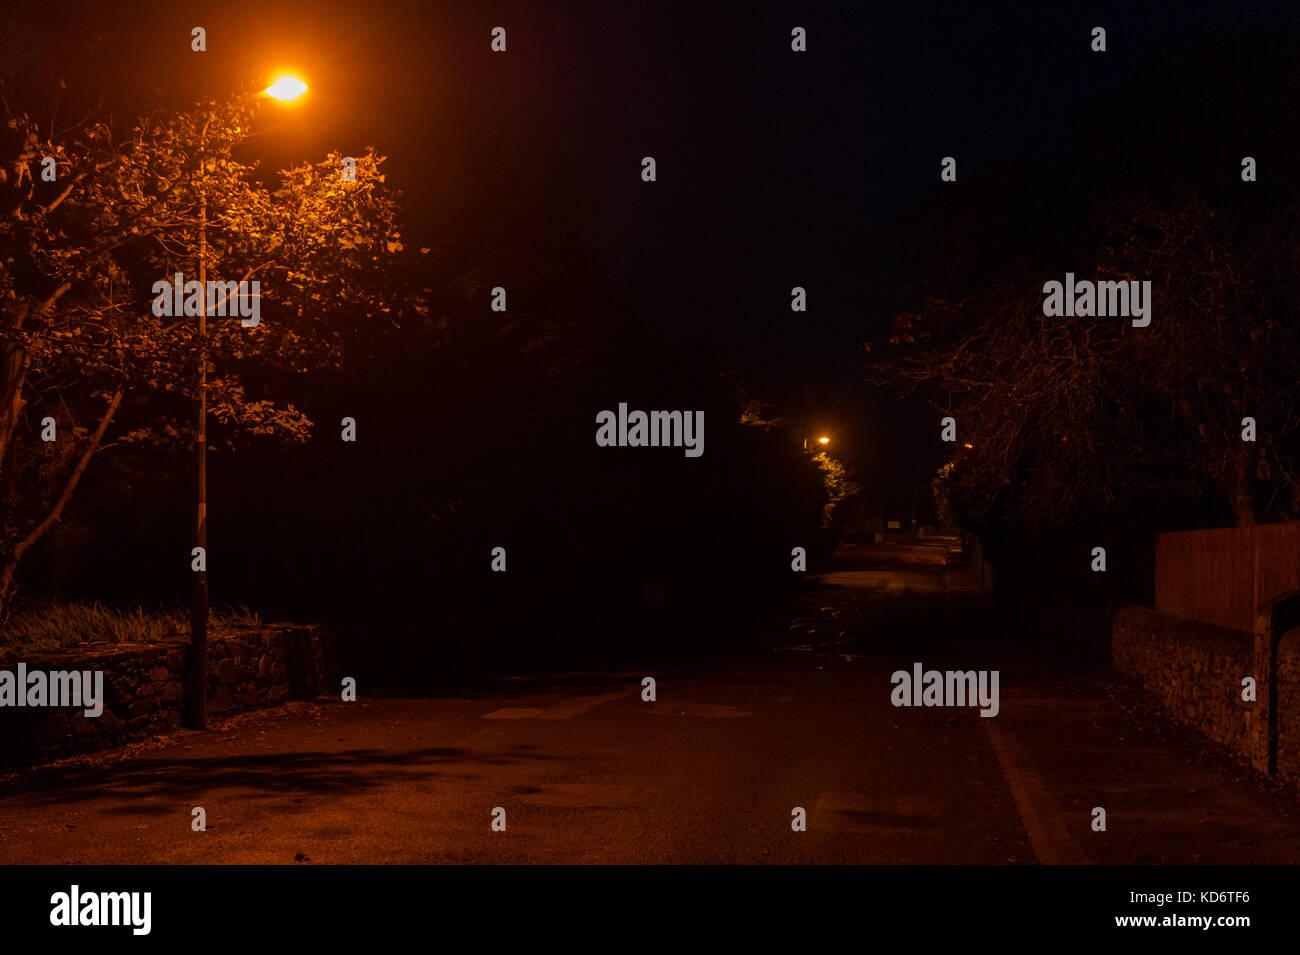 empty-road-on-a-dark-night-with-an-orange-street-light-illuminating-KD6TF6.jpg